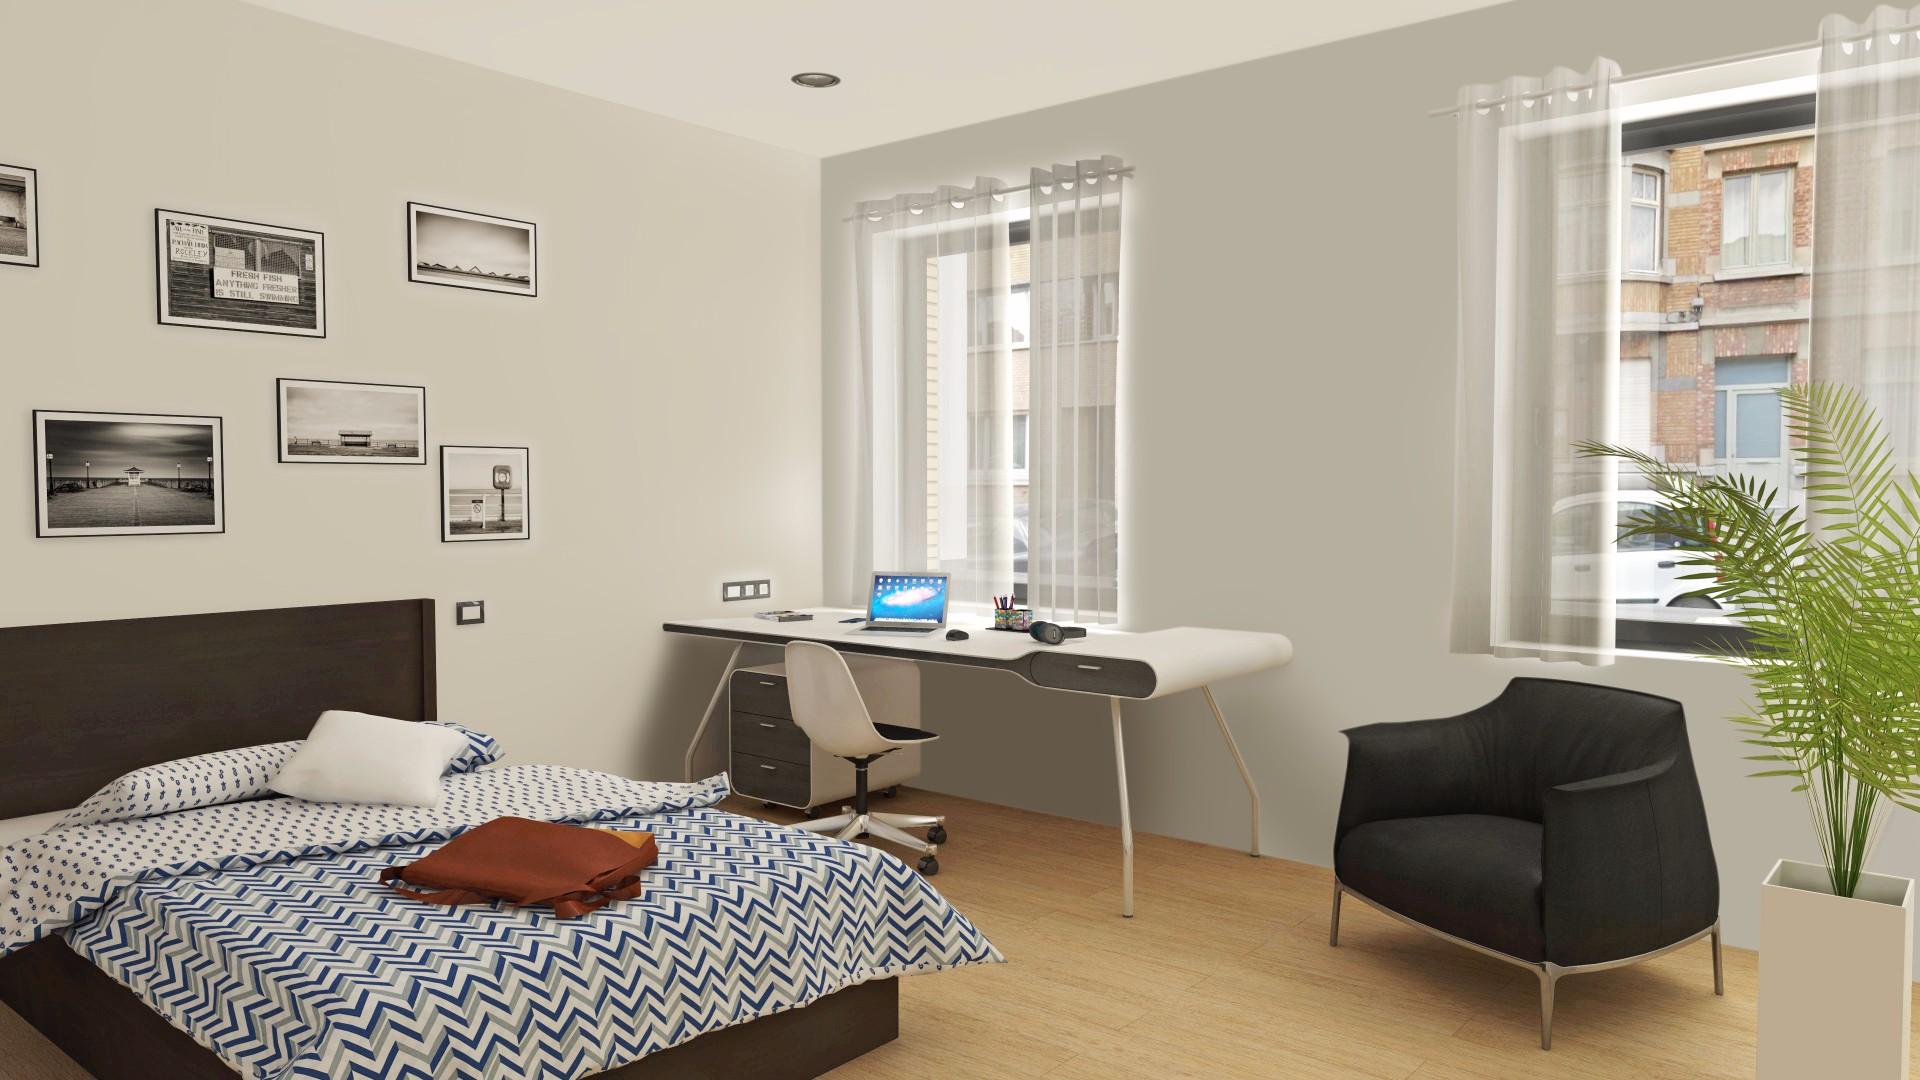 Residentie Lambertus_Interieur_1.jpg